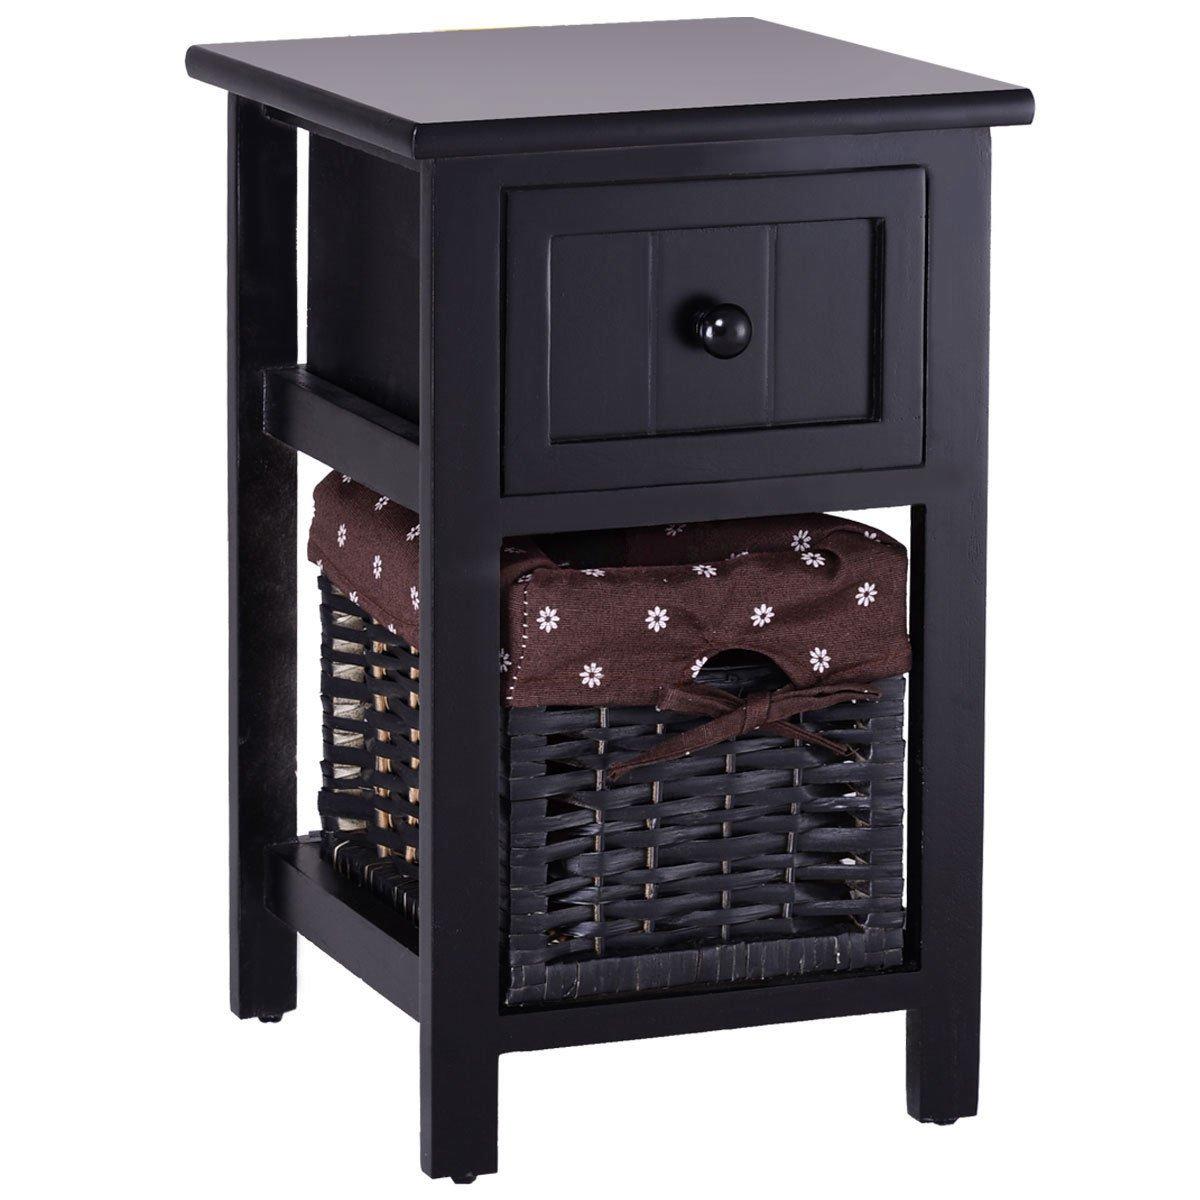 Black 18'' Wooden Nightstand Bedside Storage End Table Organizer w/Basket & Drawer